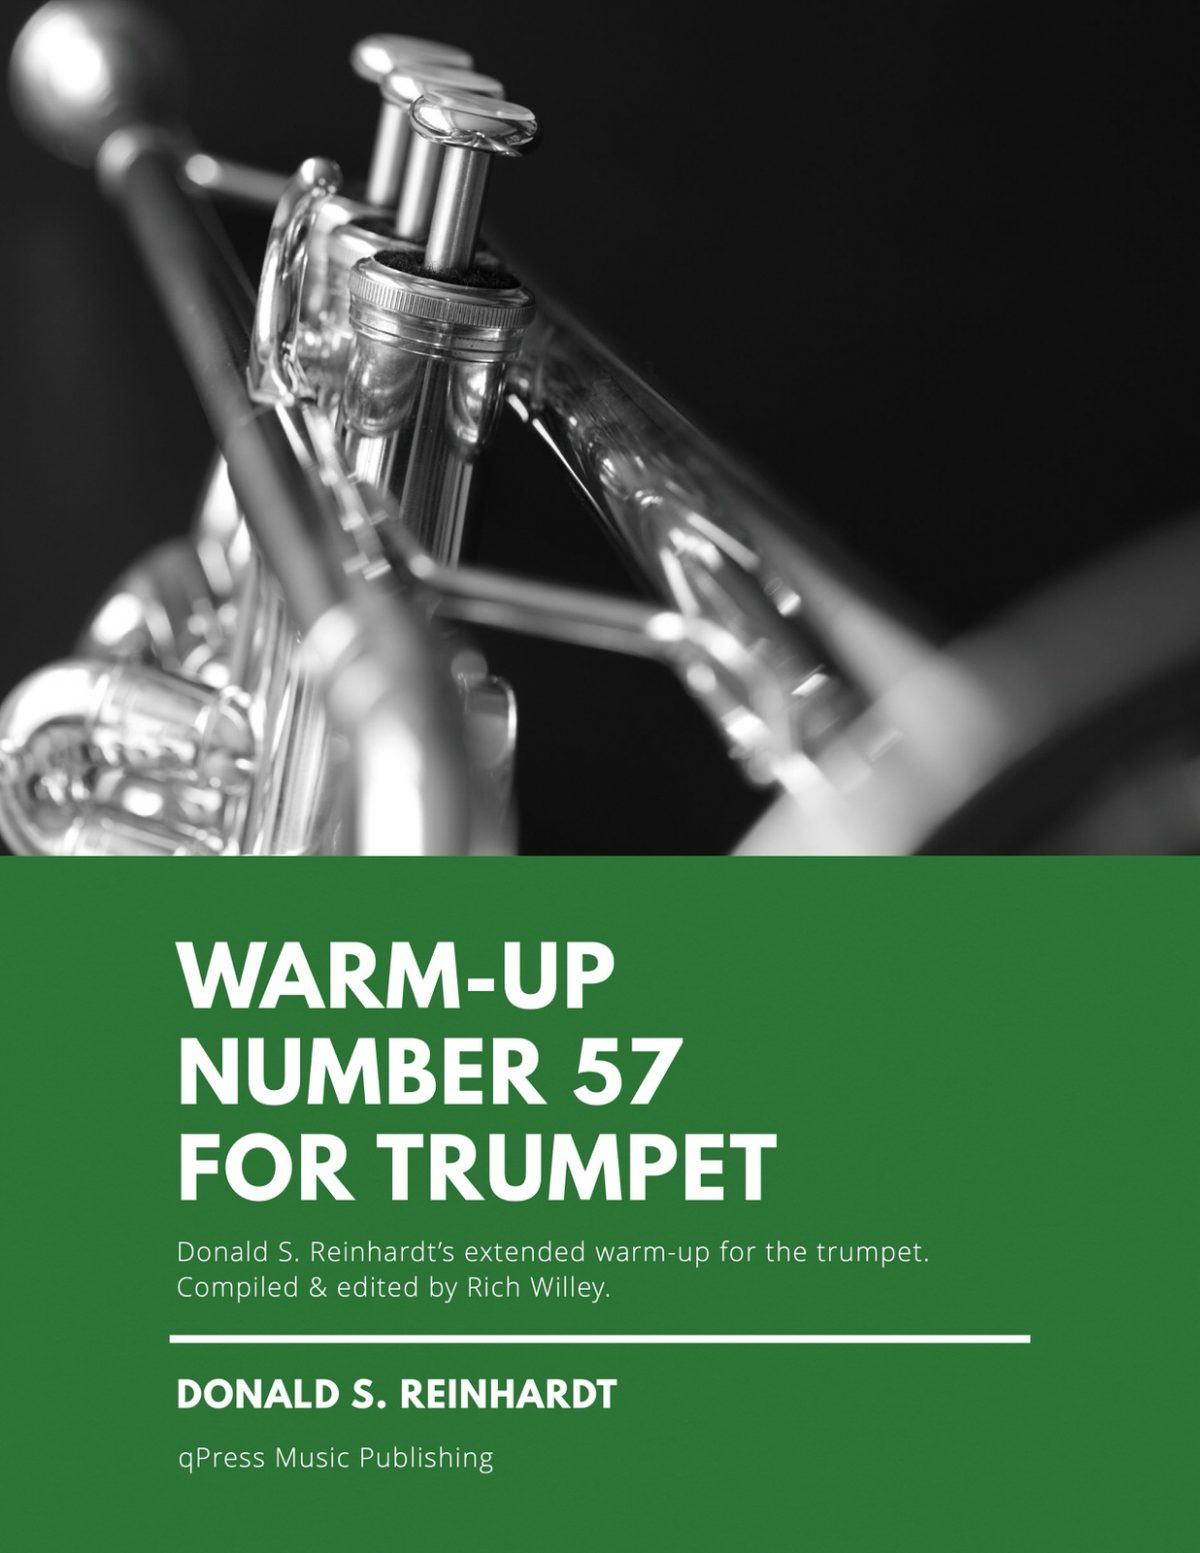 Reinhardt, Warm-Up Number 57 for Trumpet-p1